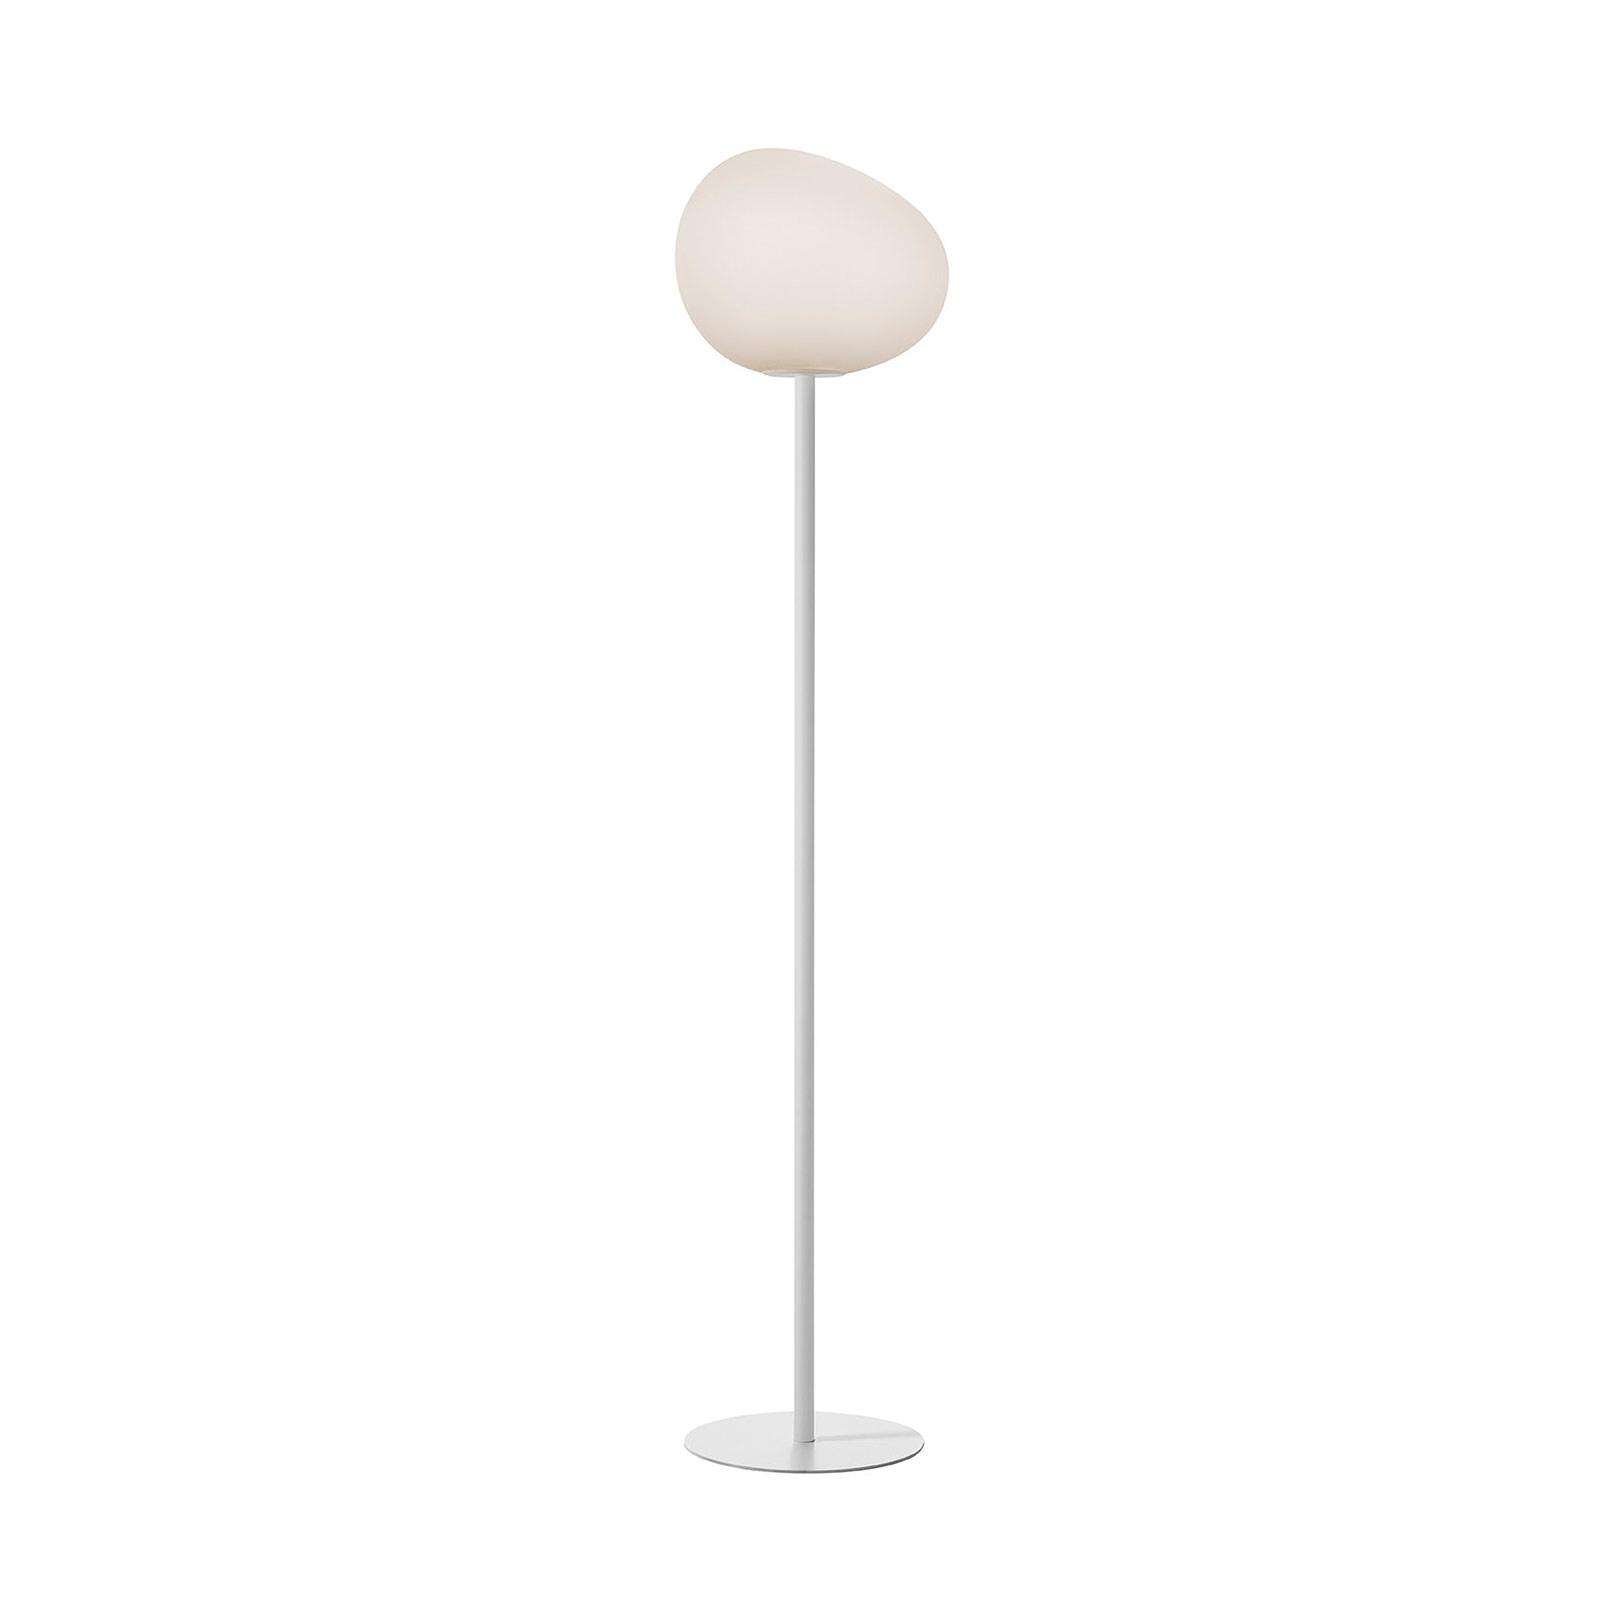 Foscarini Gregg media Stehleuchte, 151 cm, weiß